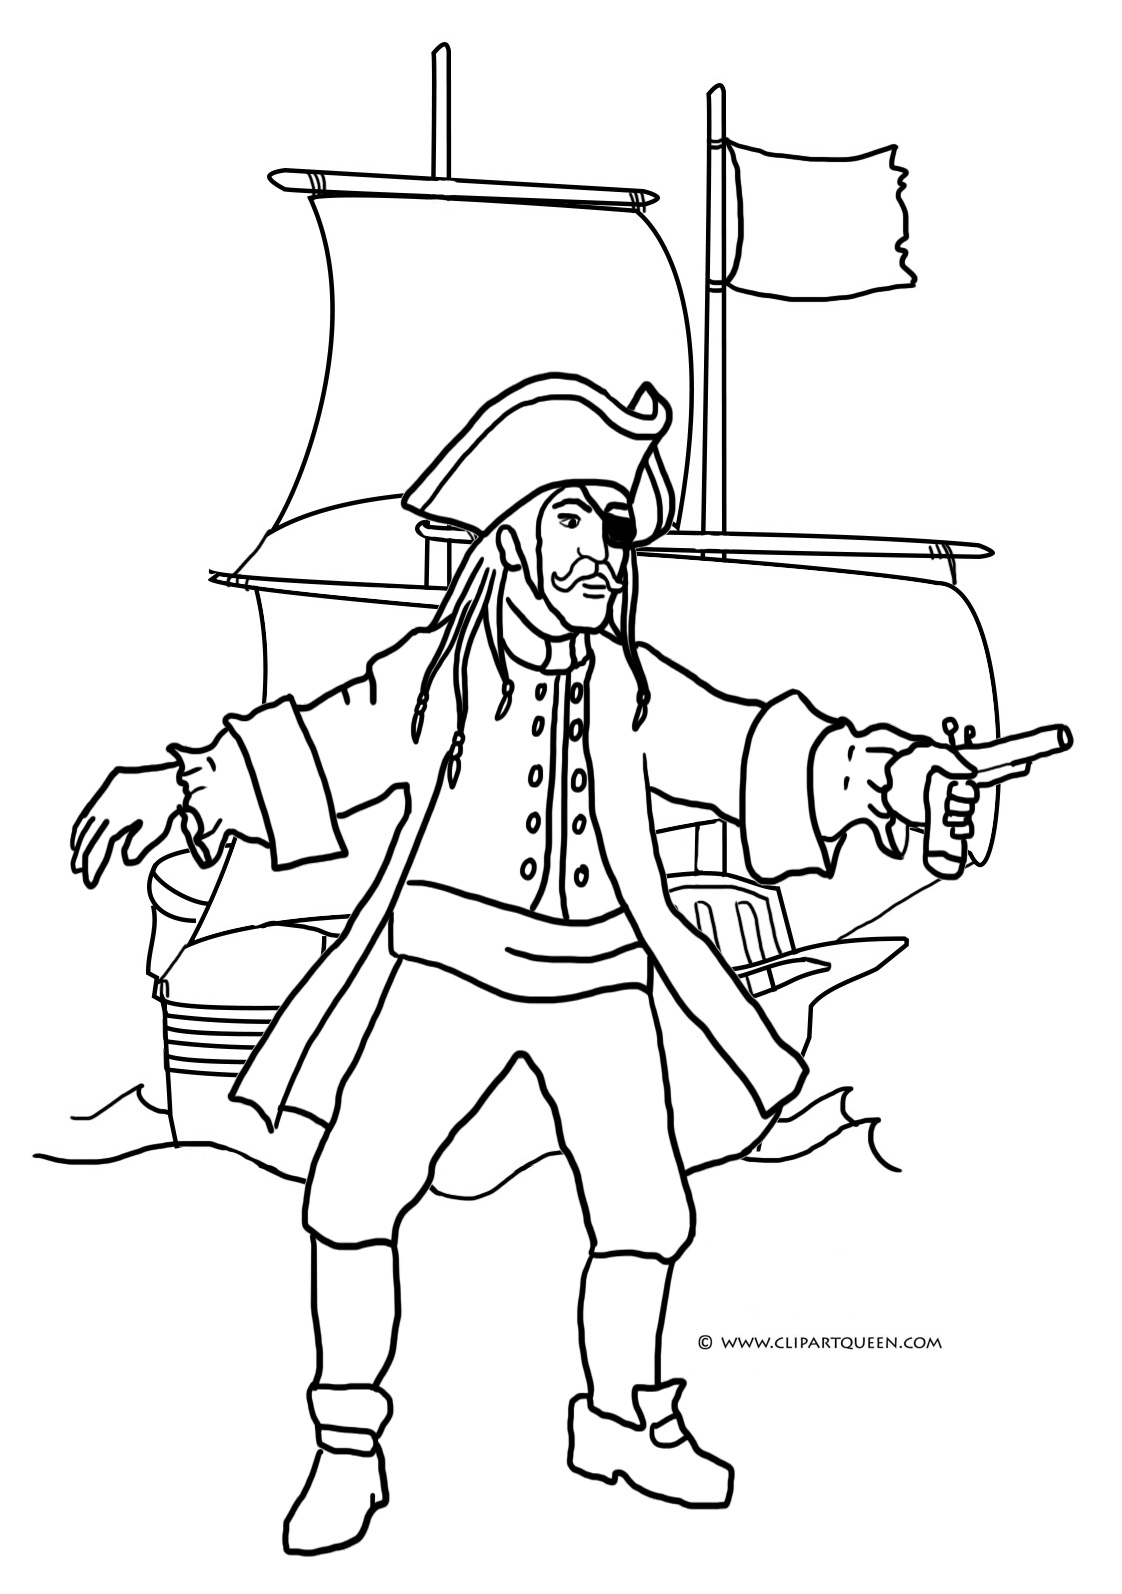 Pirate Ship Line Drawing At Getdrawings